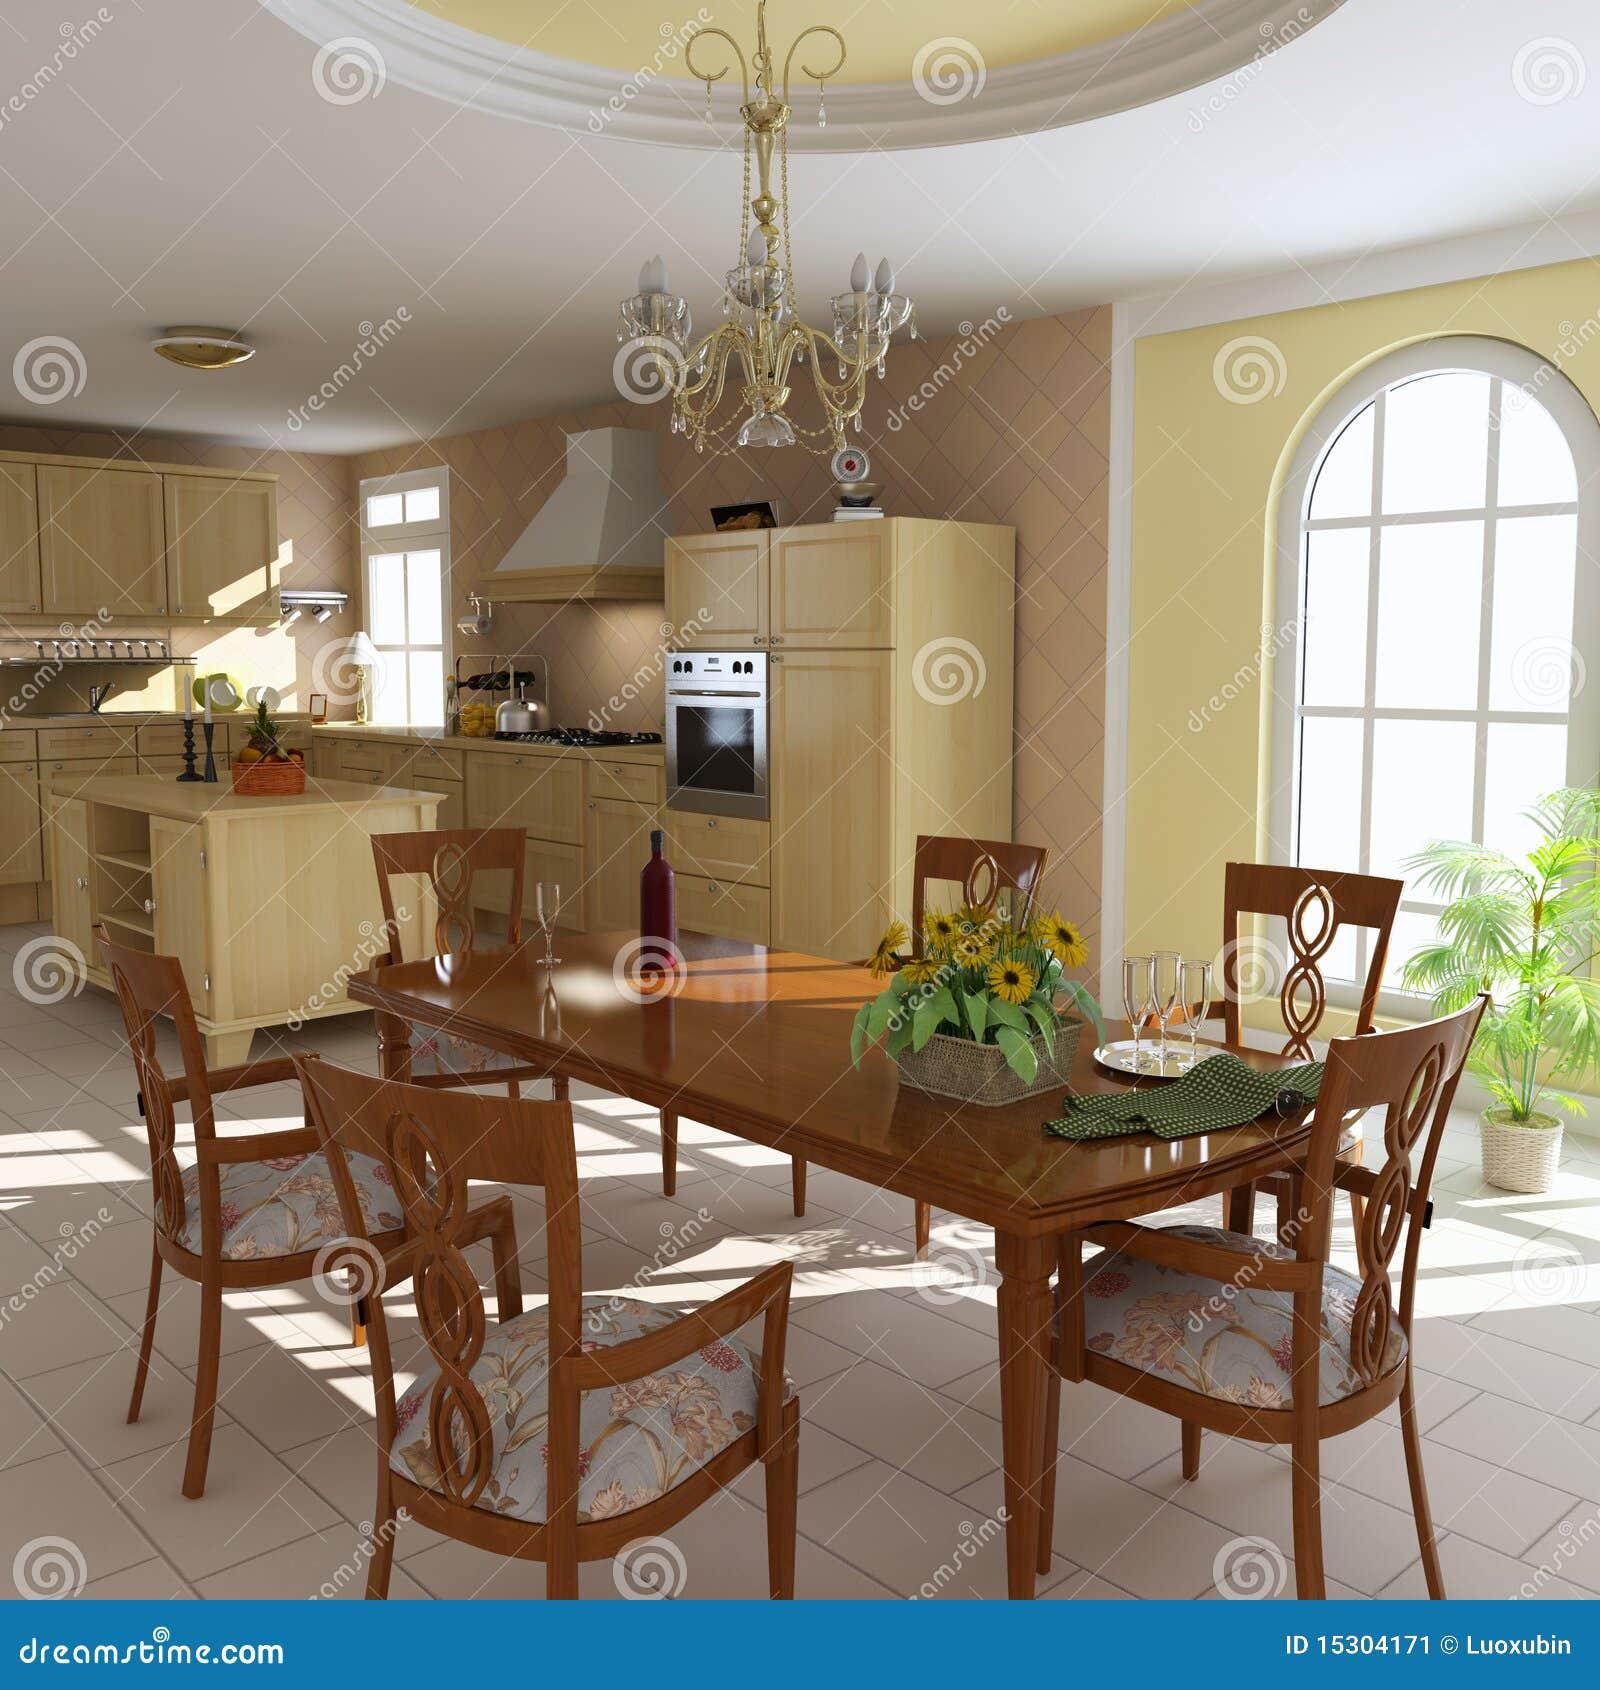 Salle manger et cuisine classiques image stock image for Salle a manger 3d